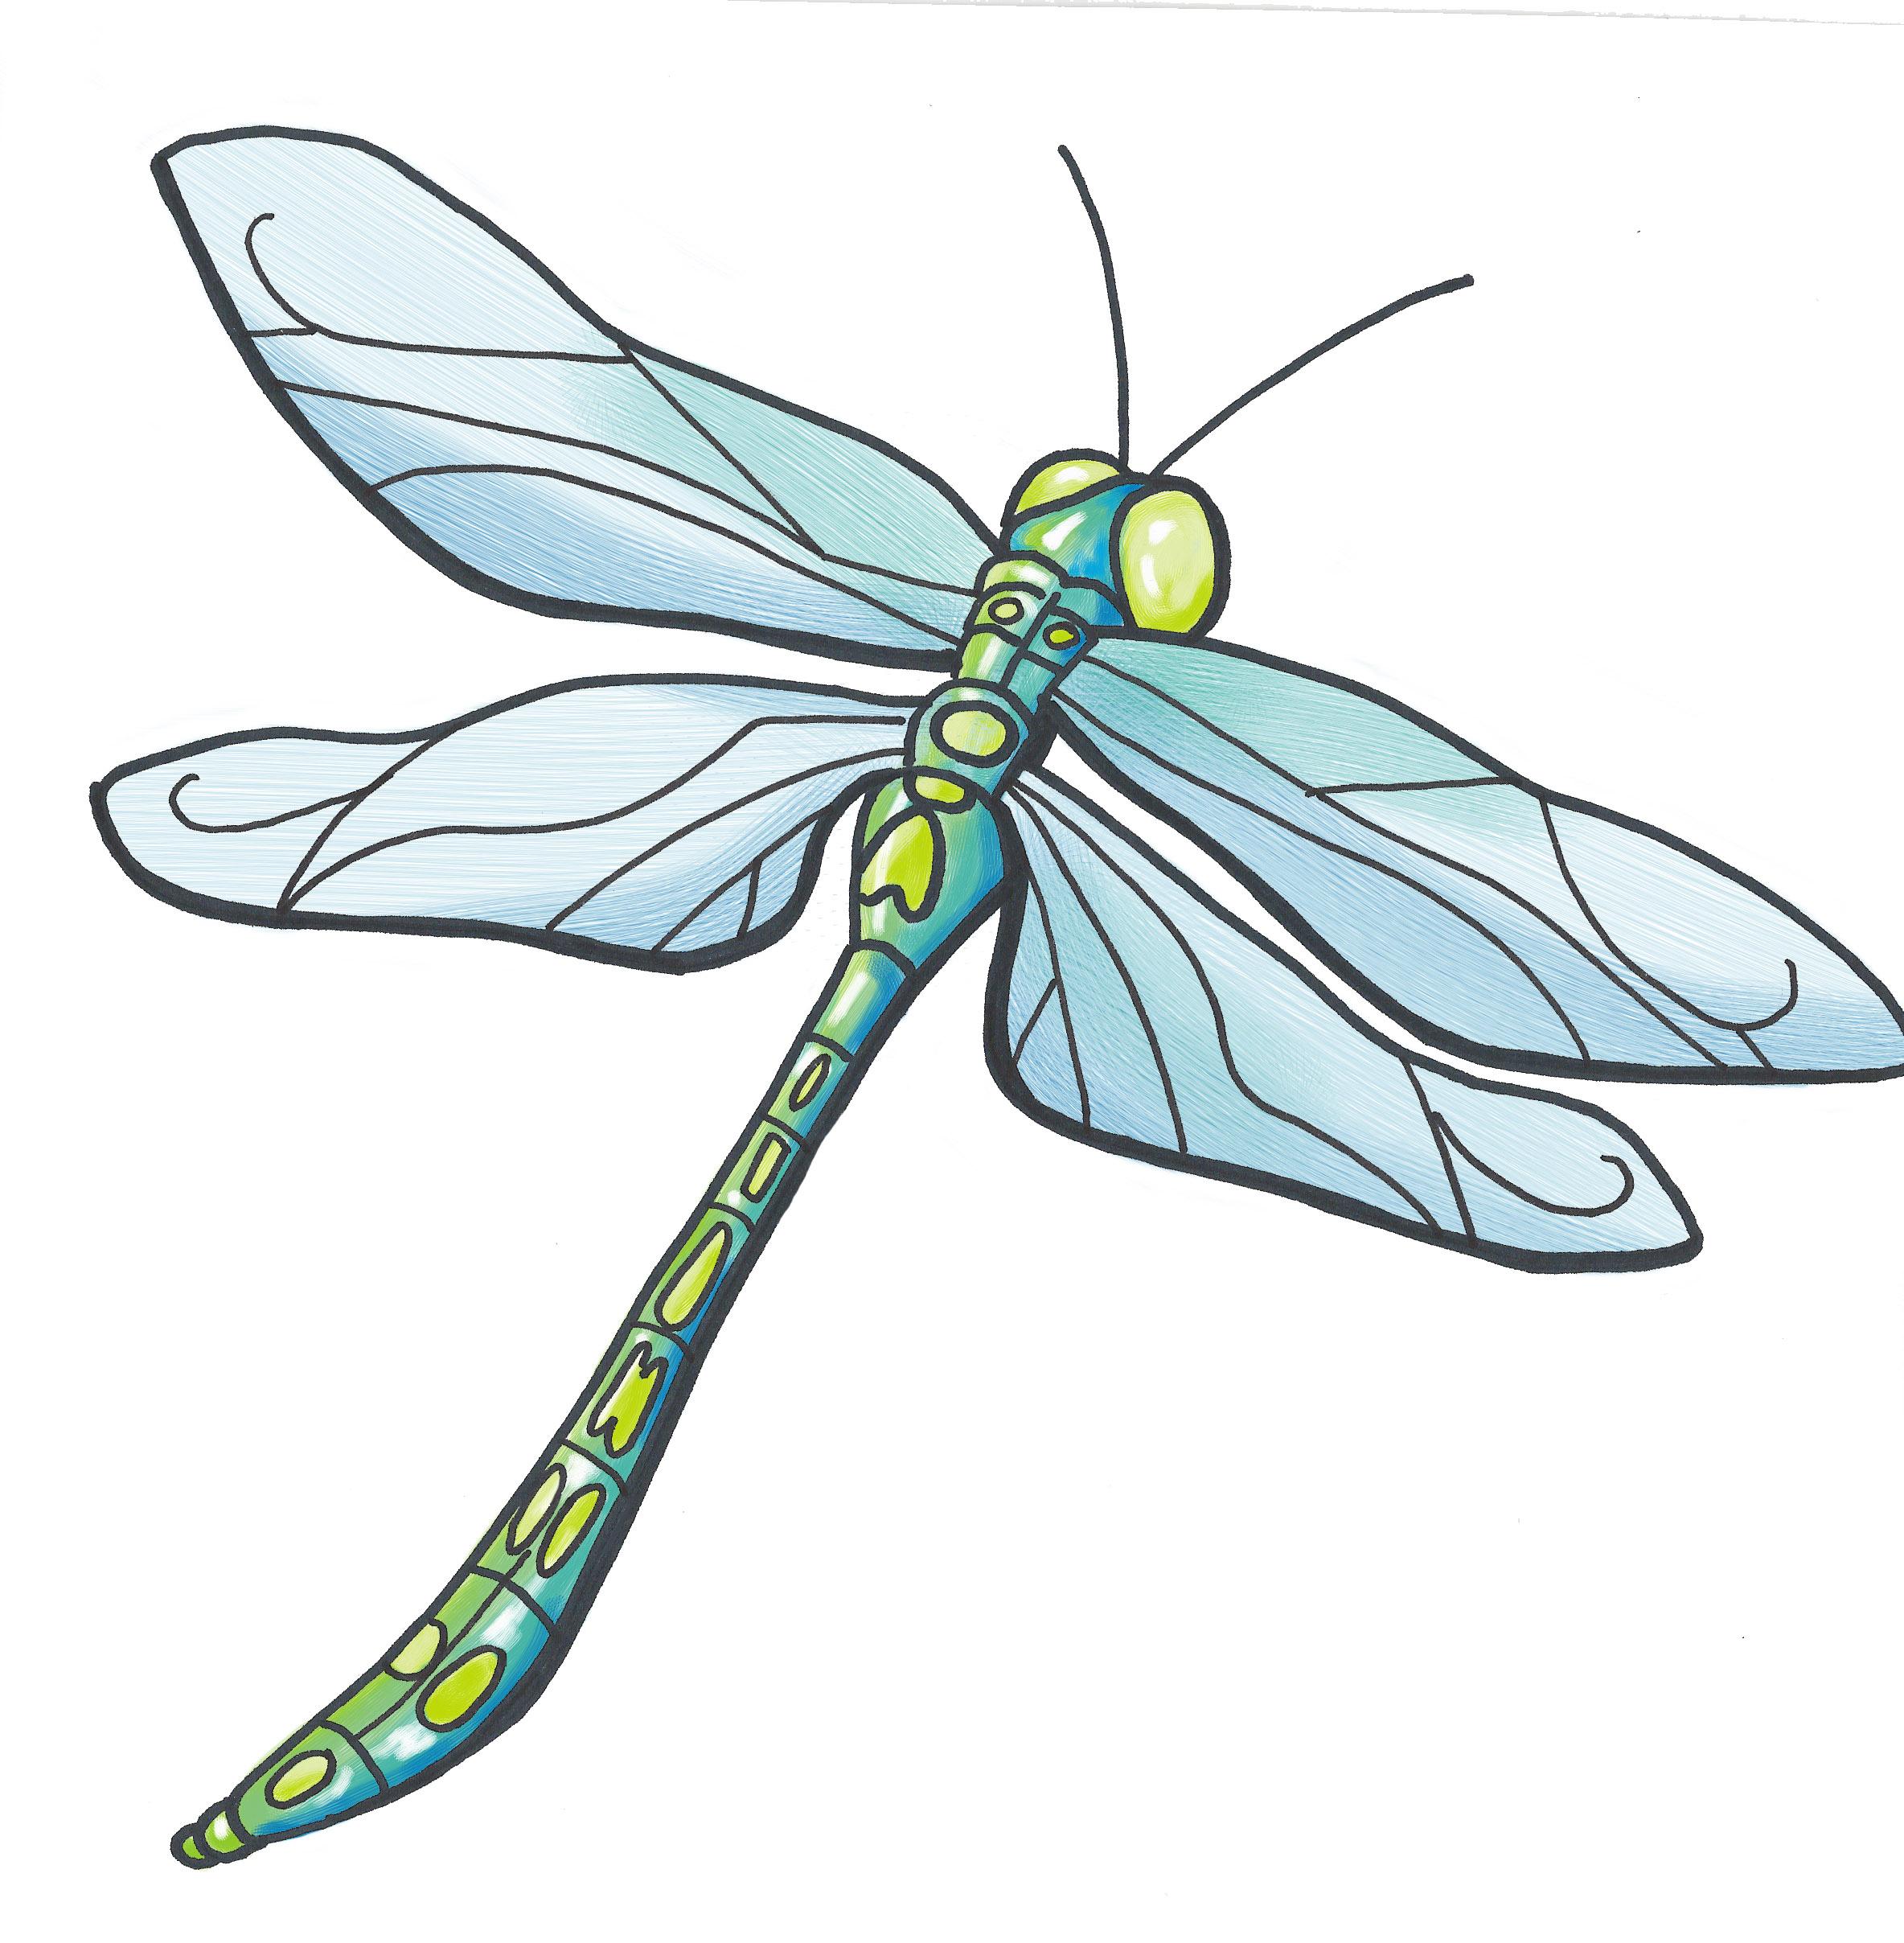 - dragonfly illustration 3 -